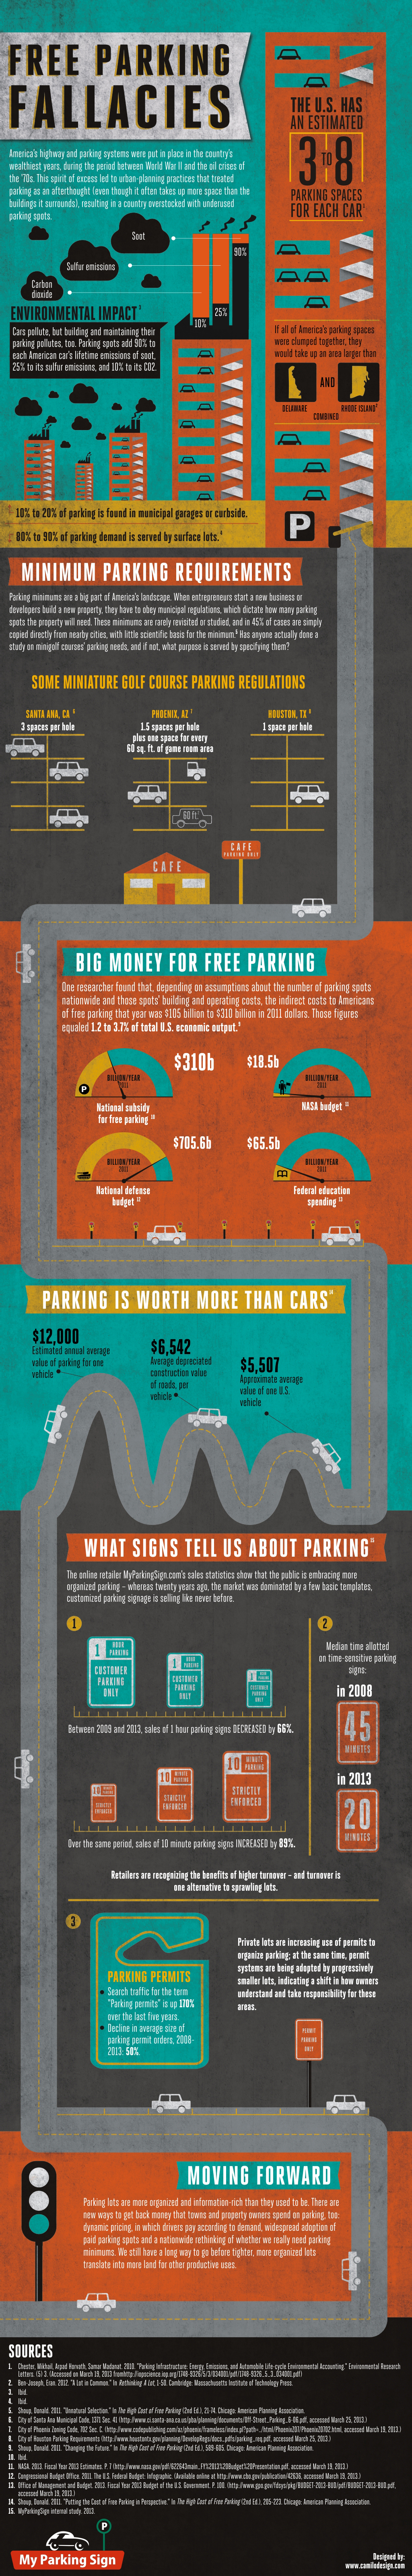 Free Parking Fallacies